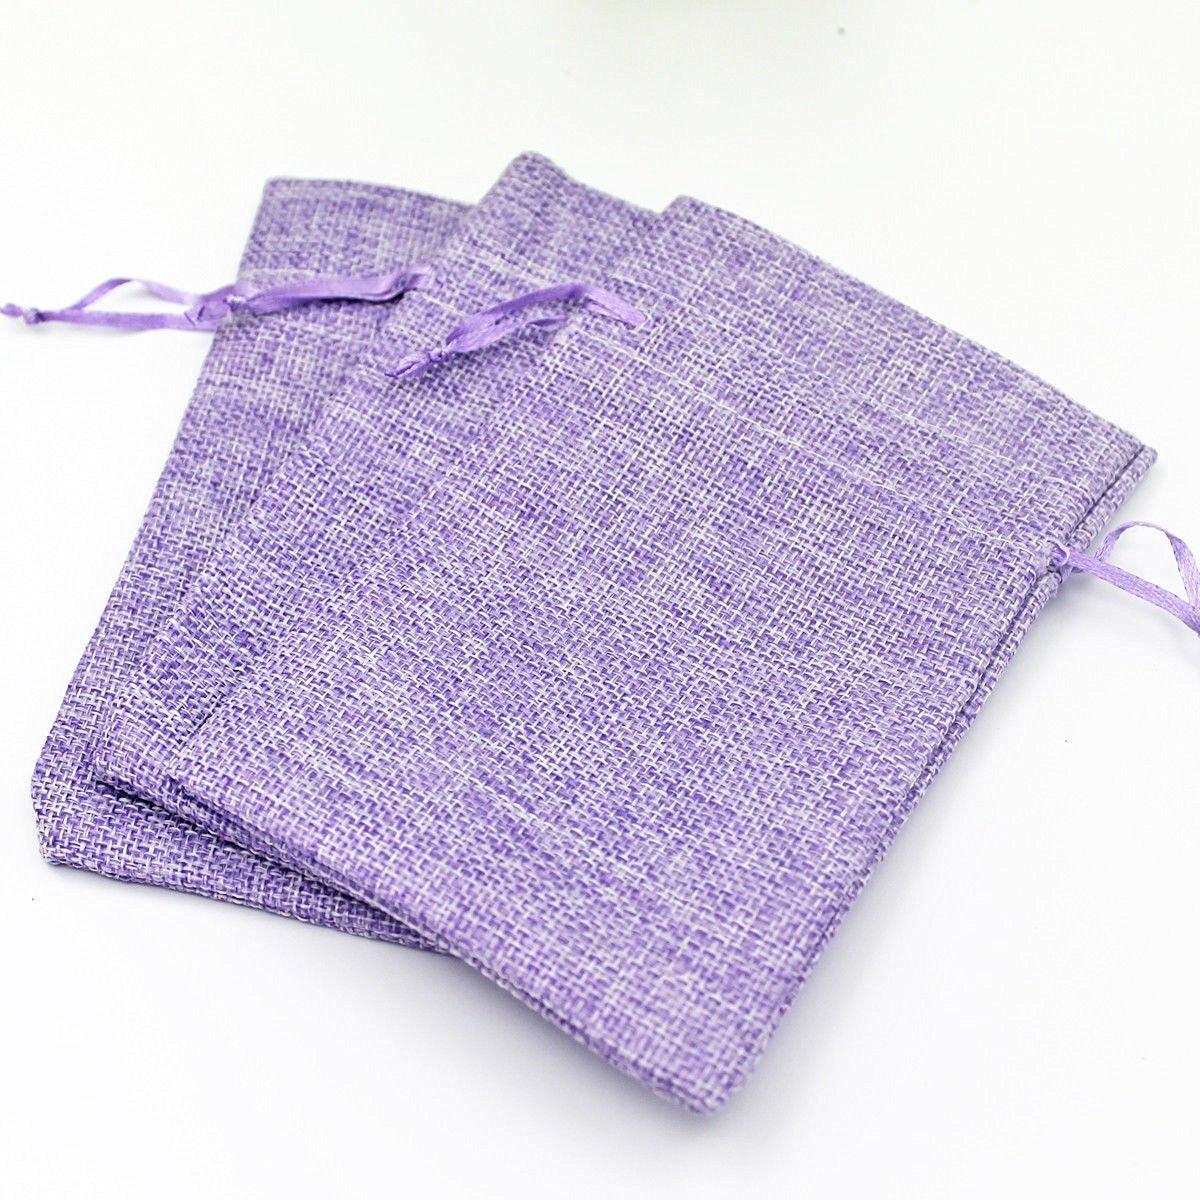 Bingirl 9x12cm 10x15cm Burlap Bags Jewelry Pouches Wedding Favor Christmas Gift Bags 10x15cm 25